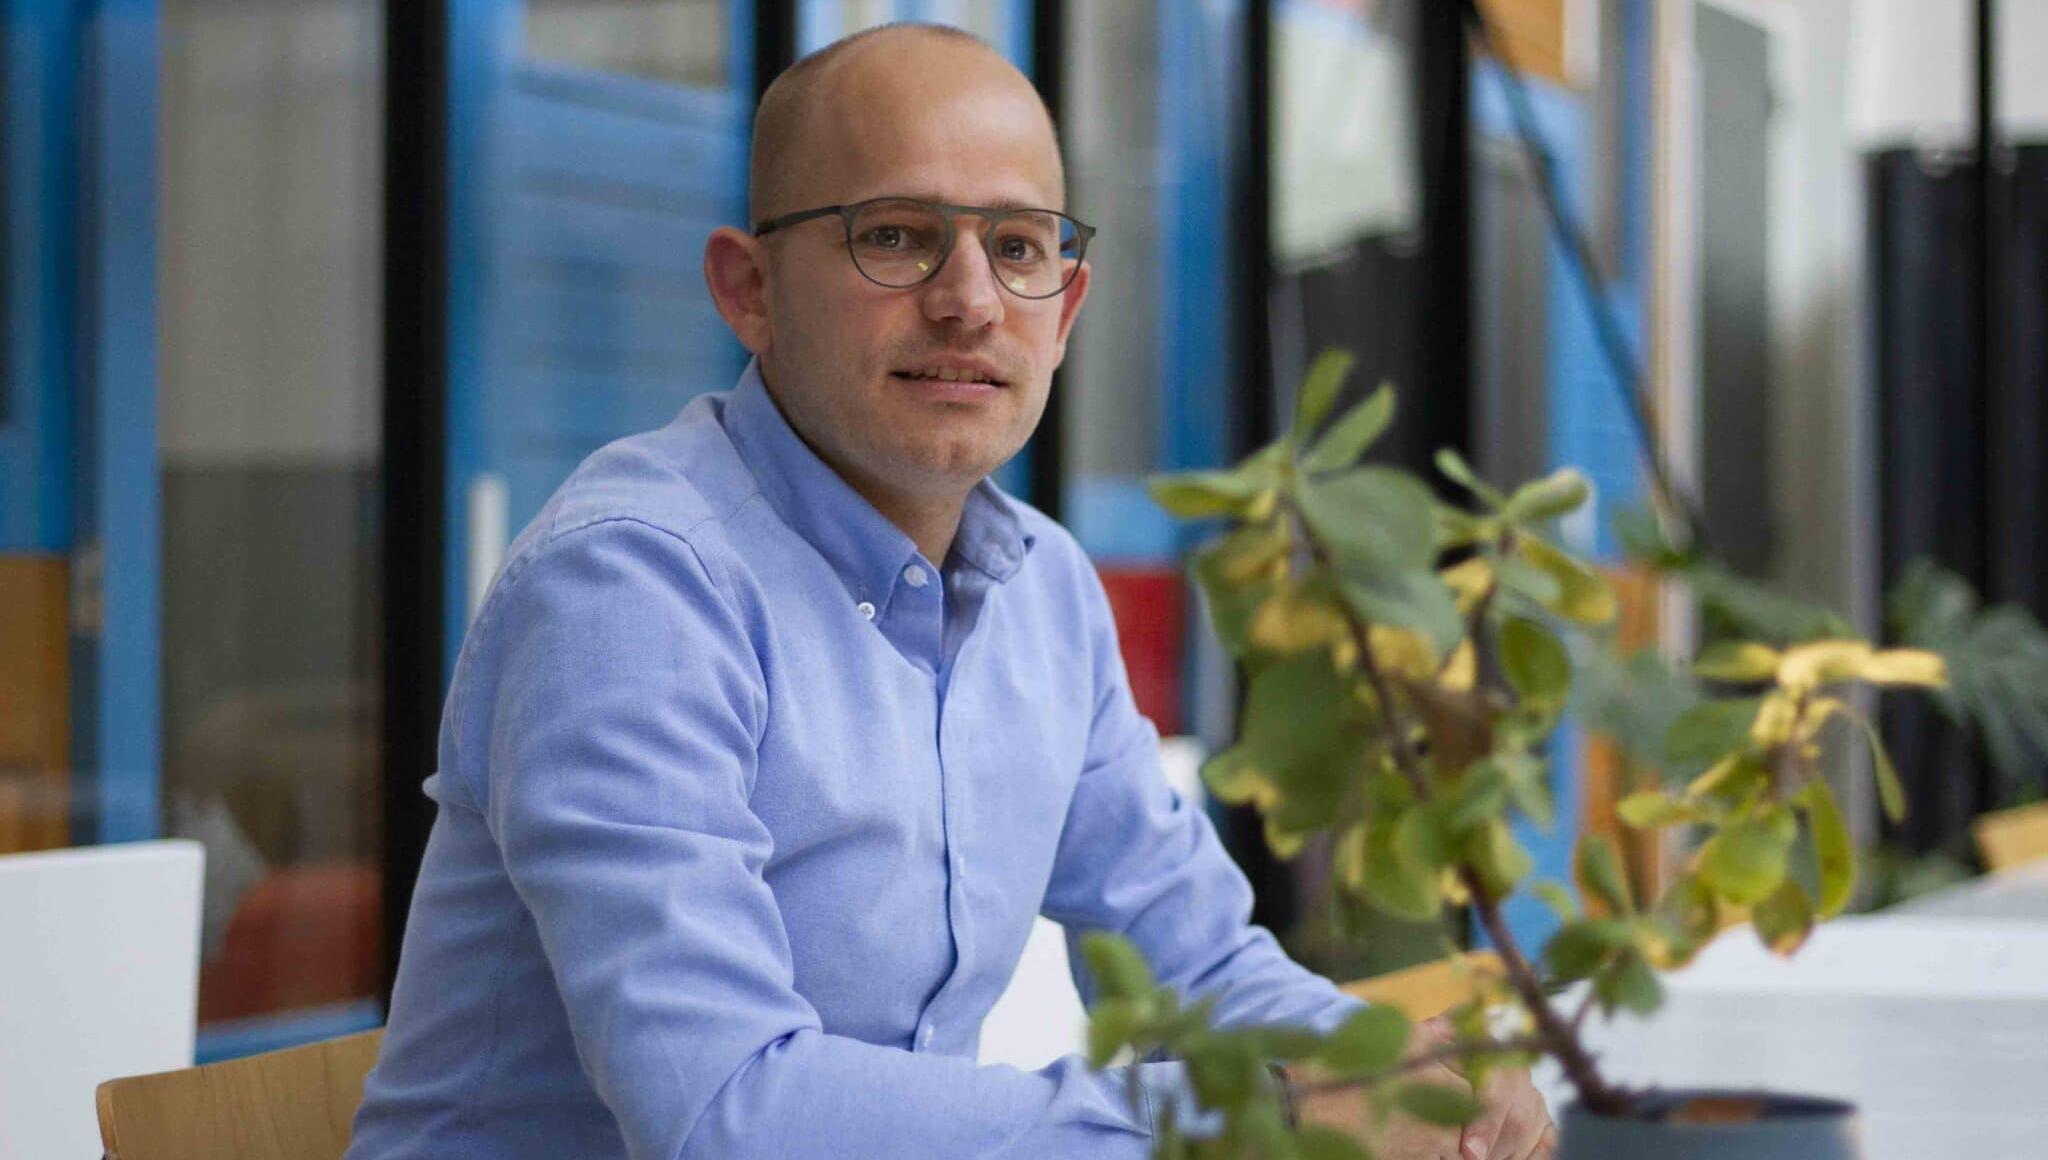 Maak kennis met Pieter | Over ons | MondoMarketing l Performance Driven Digital Marketing Bureau